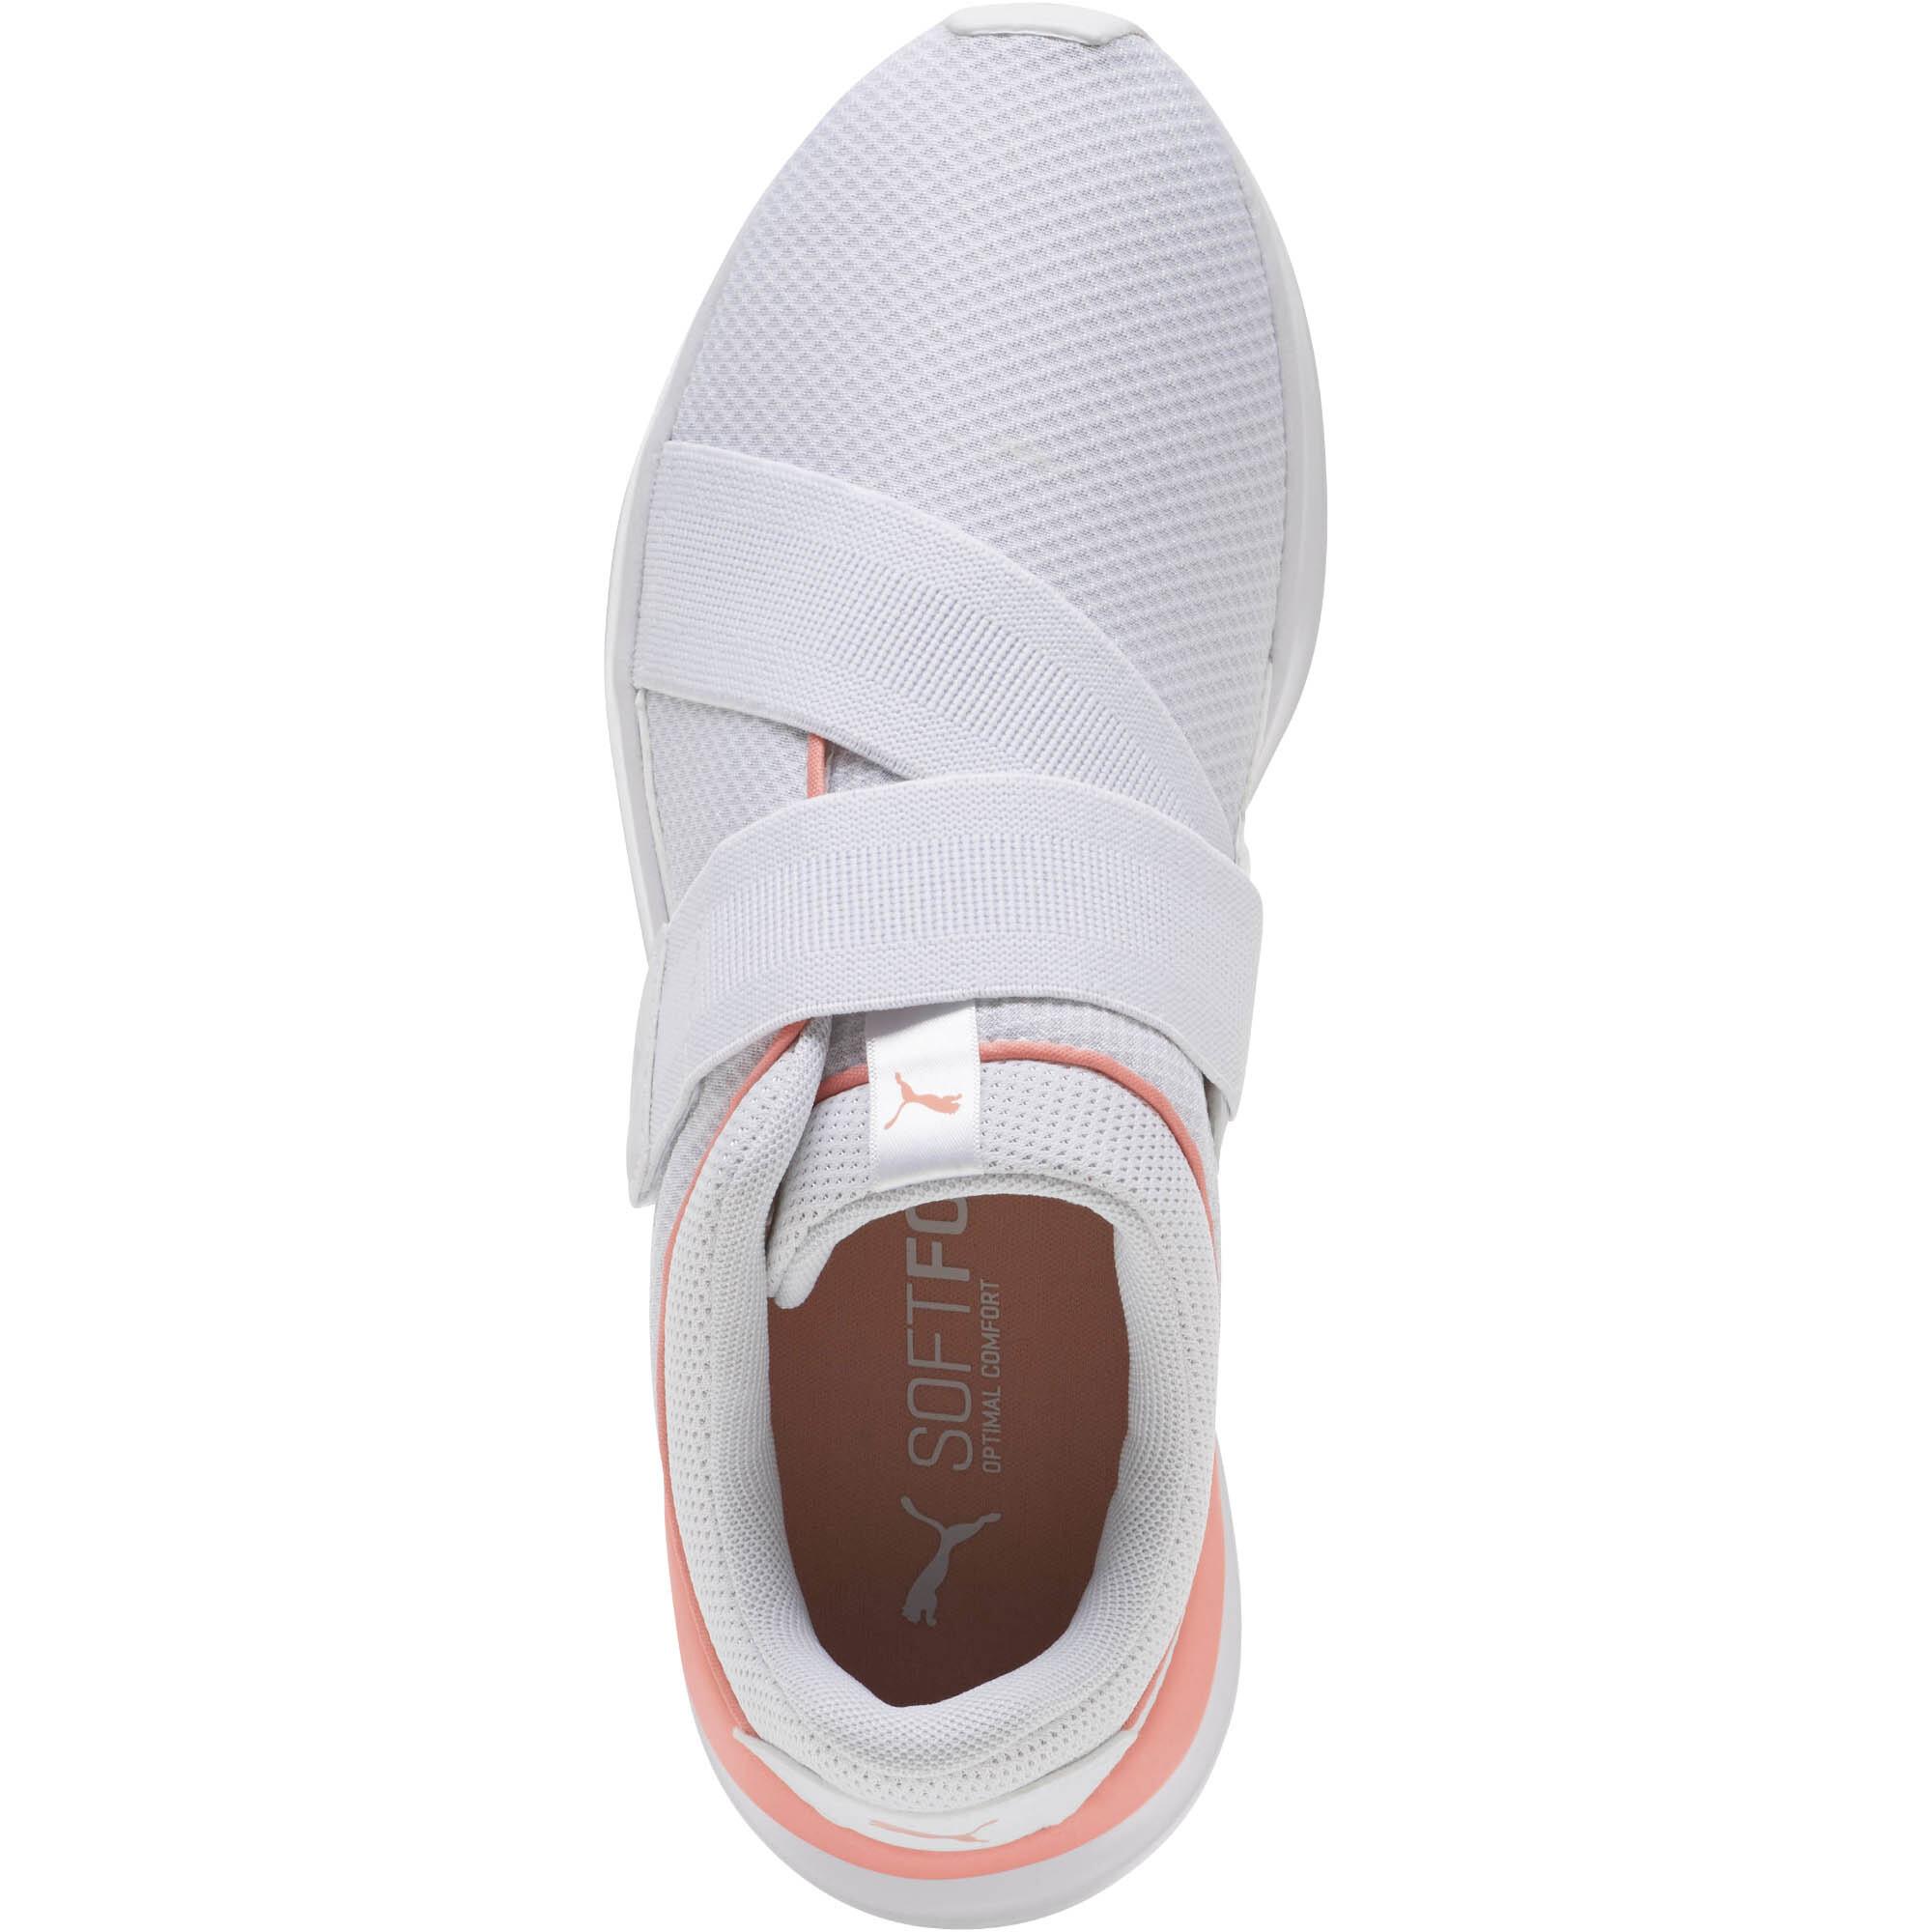 PUMA-Adela-X-Women-s-Sneakers-Women-Shoe-Basics thumbnail 18